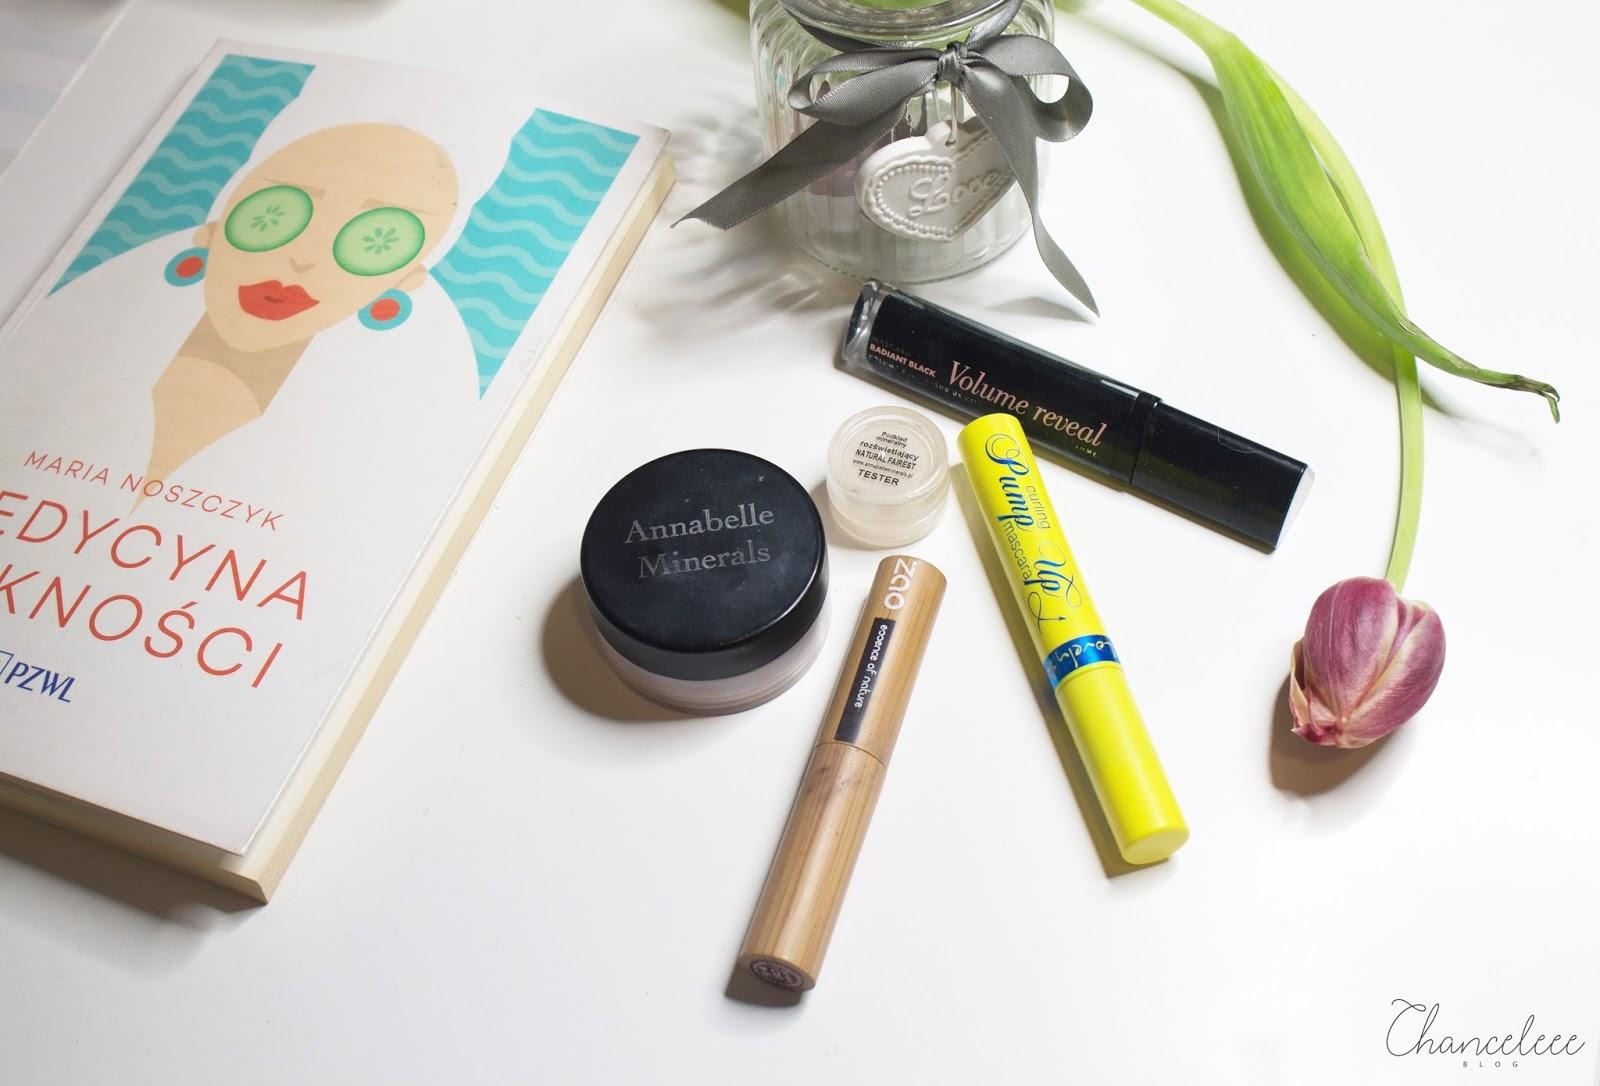 anabelle minerals, zao makeup, lovely, bourjois - zużycia kwietnia 2017